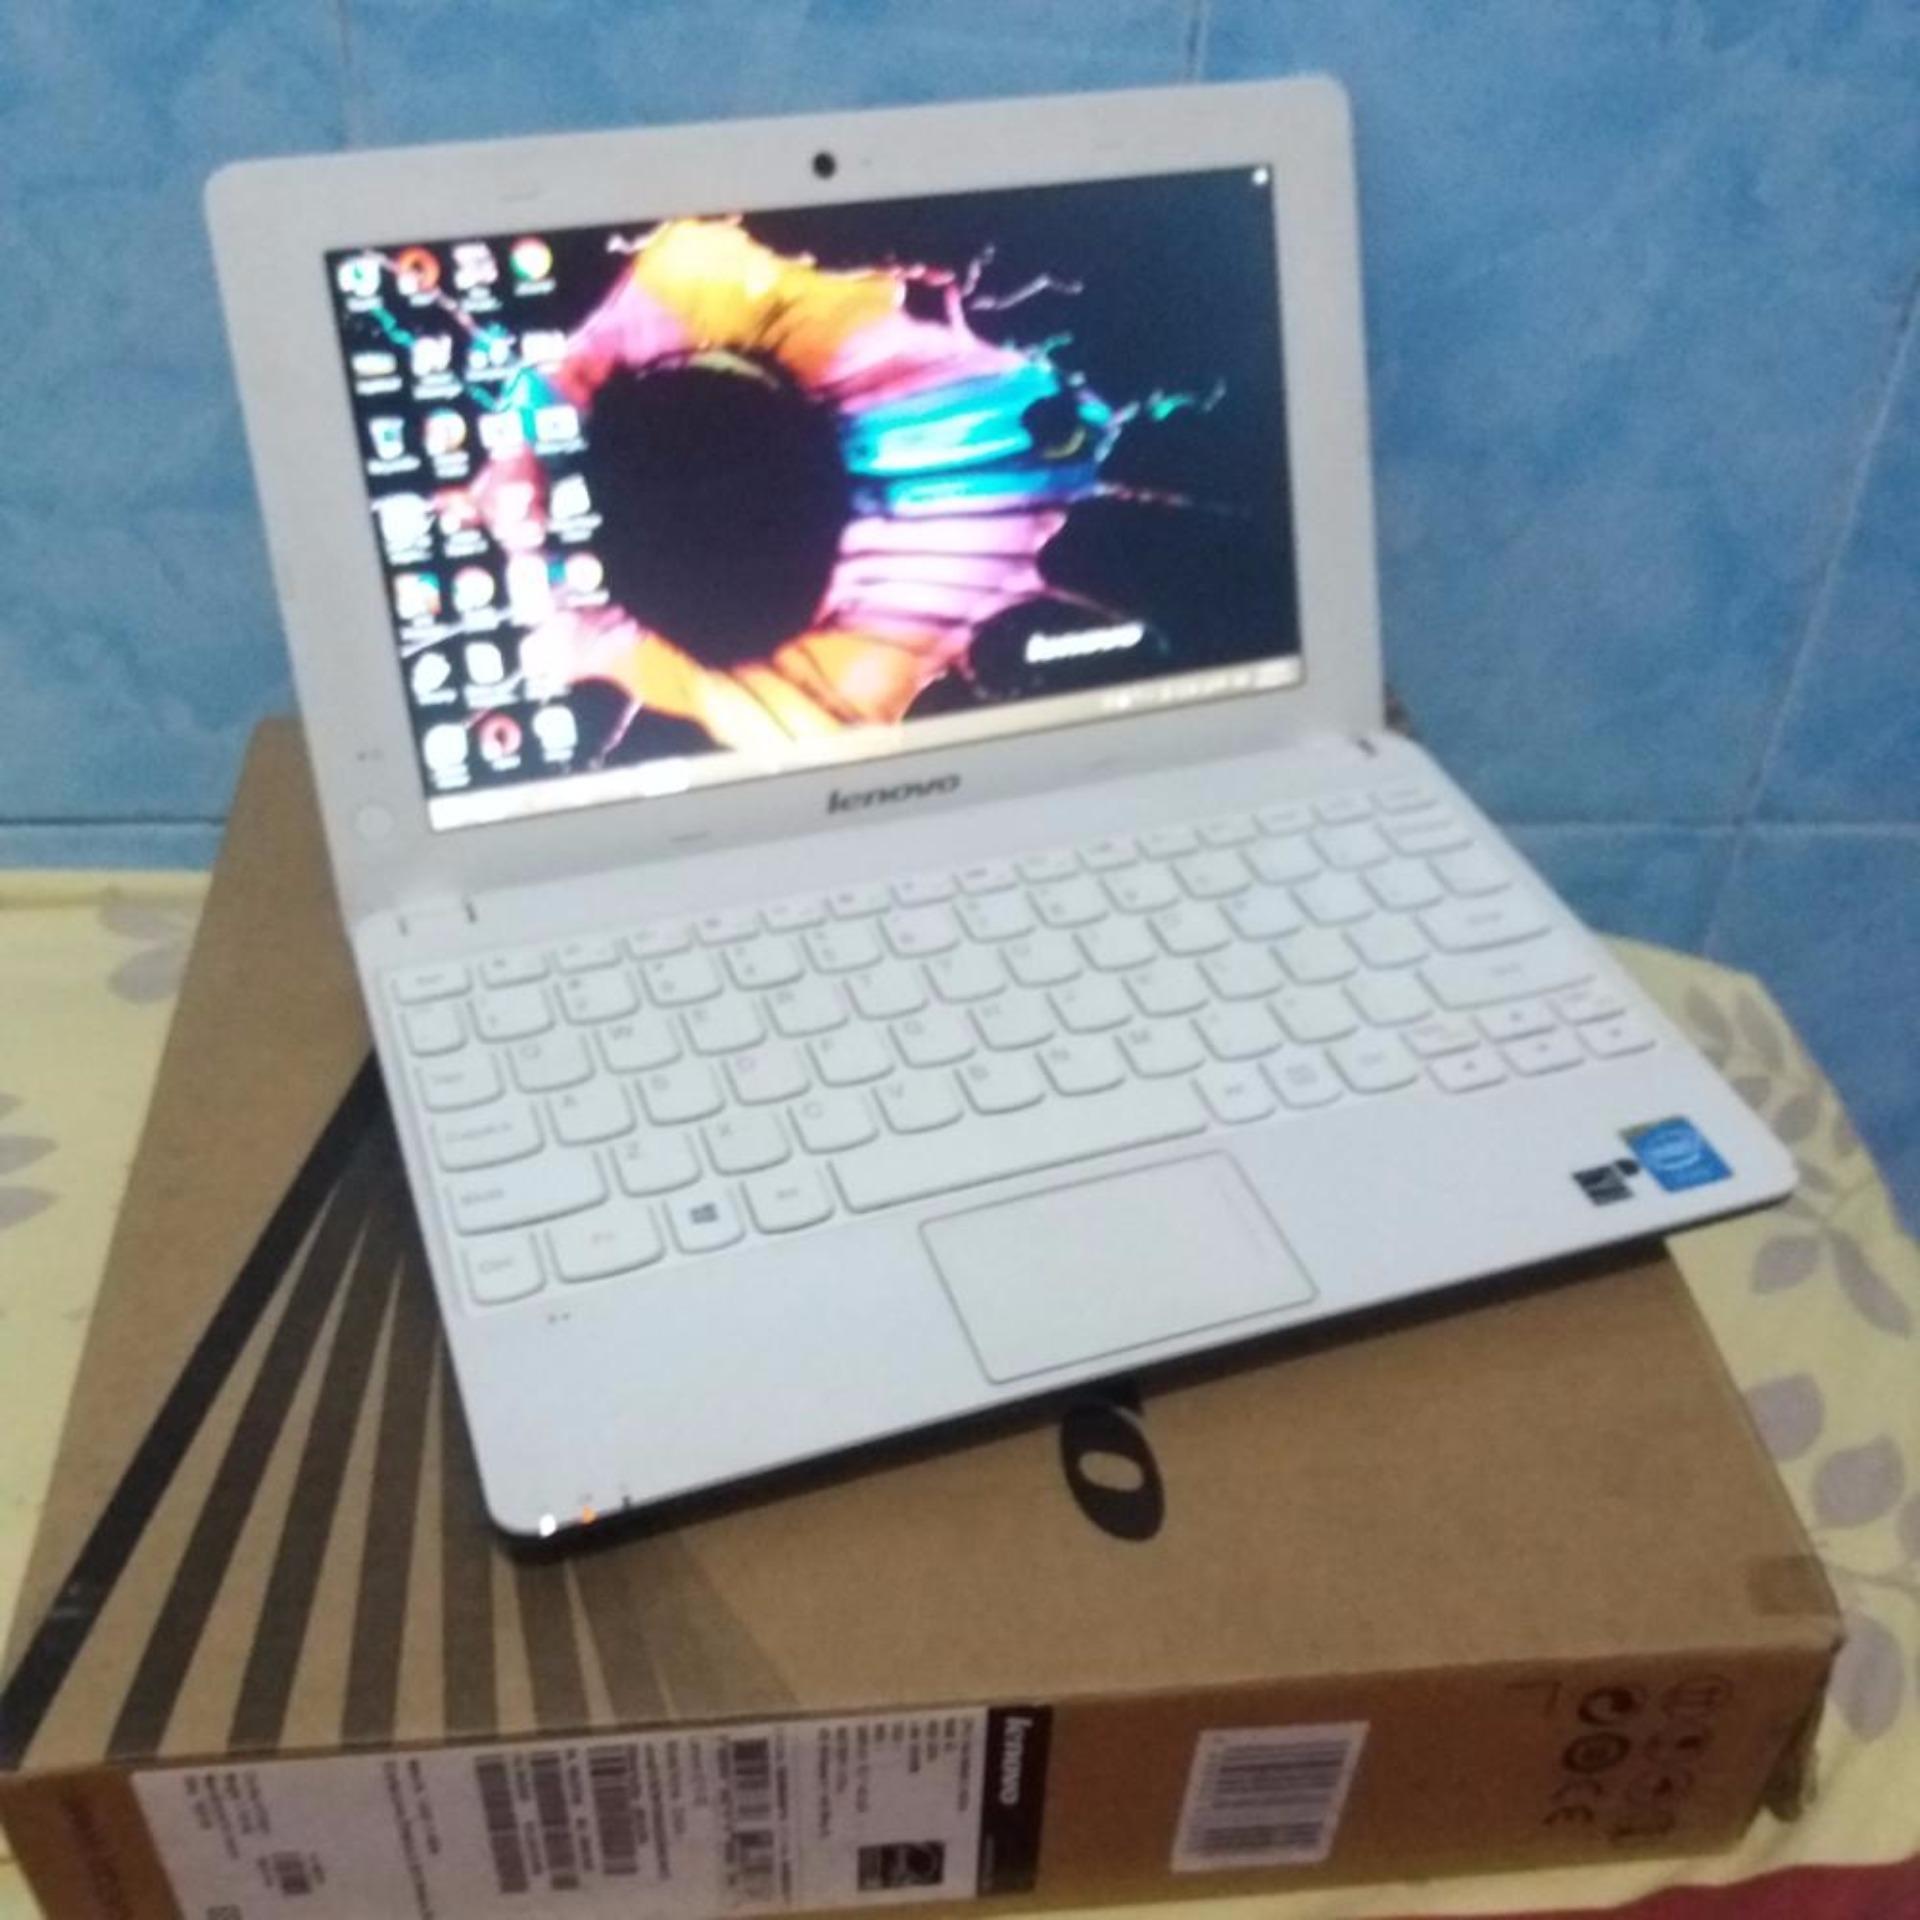 Pastimaksi Gadgets Beli Acer Aspire E5 475g Intel Kabylake Core Notebook Grey I5 7200u 4gb Ddr4 Gt940mx 2gb Ddr5 1tb Hdd Dos 11 Kg 24 Lbs Lenovo E10